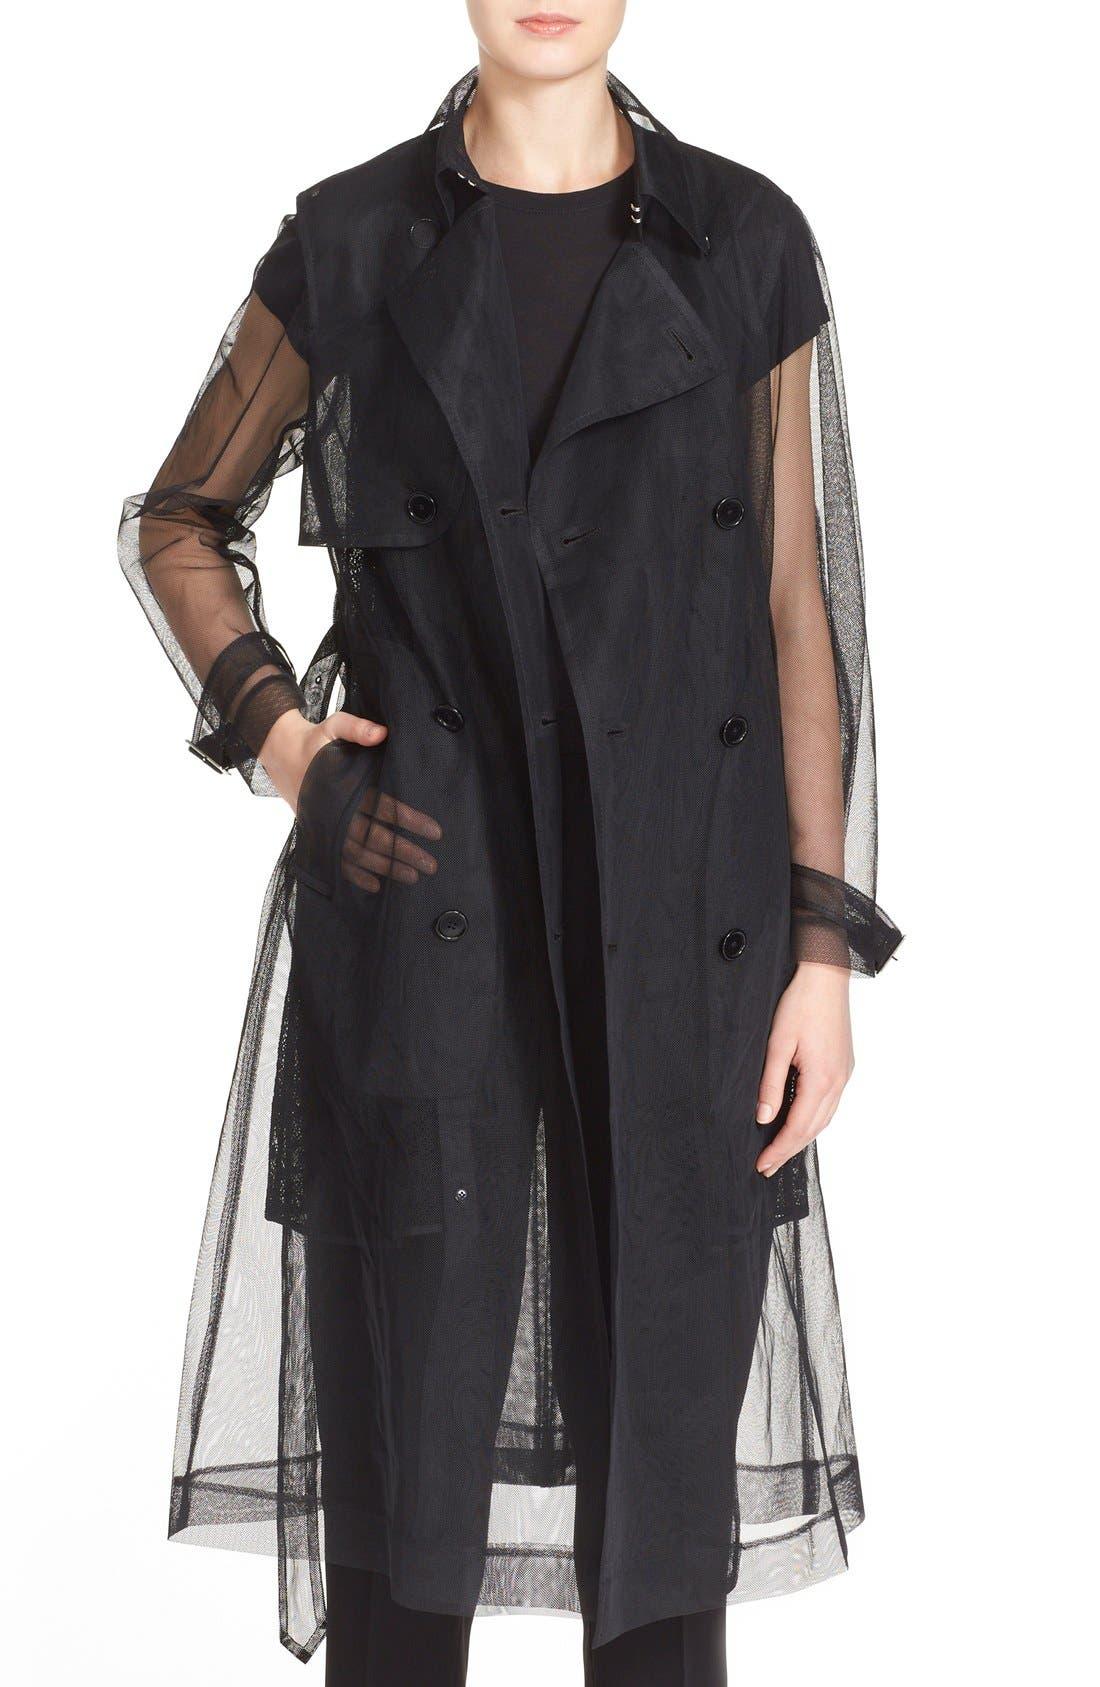 Alternate Image 1 Selected - noir kei ninomiya Sheer Tulle Trench Coat